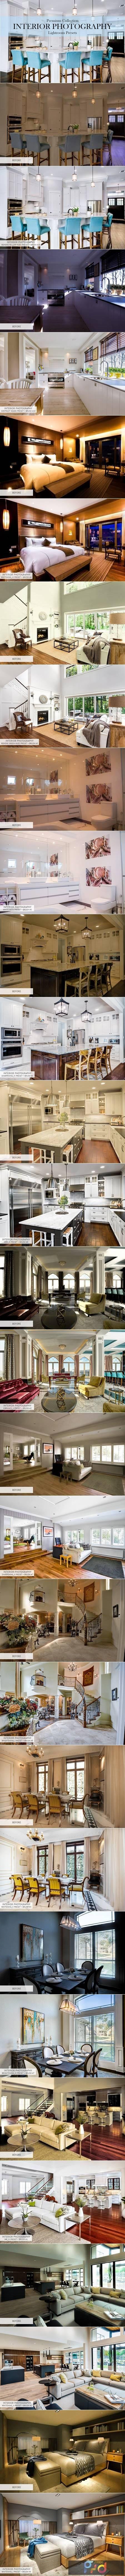 Interior Photography Lr Presets 3423530 1